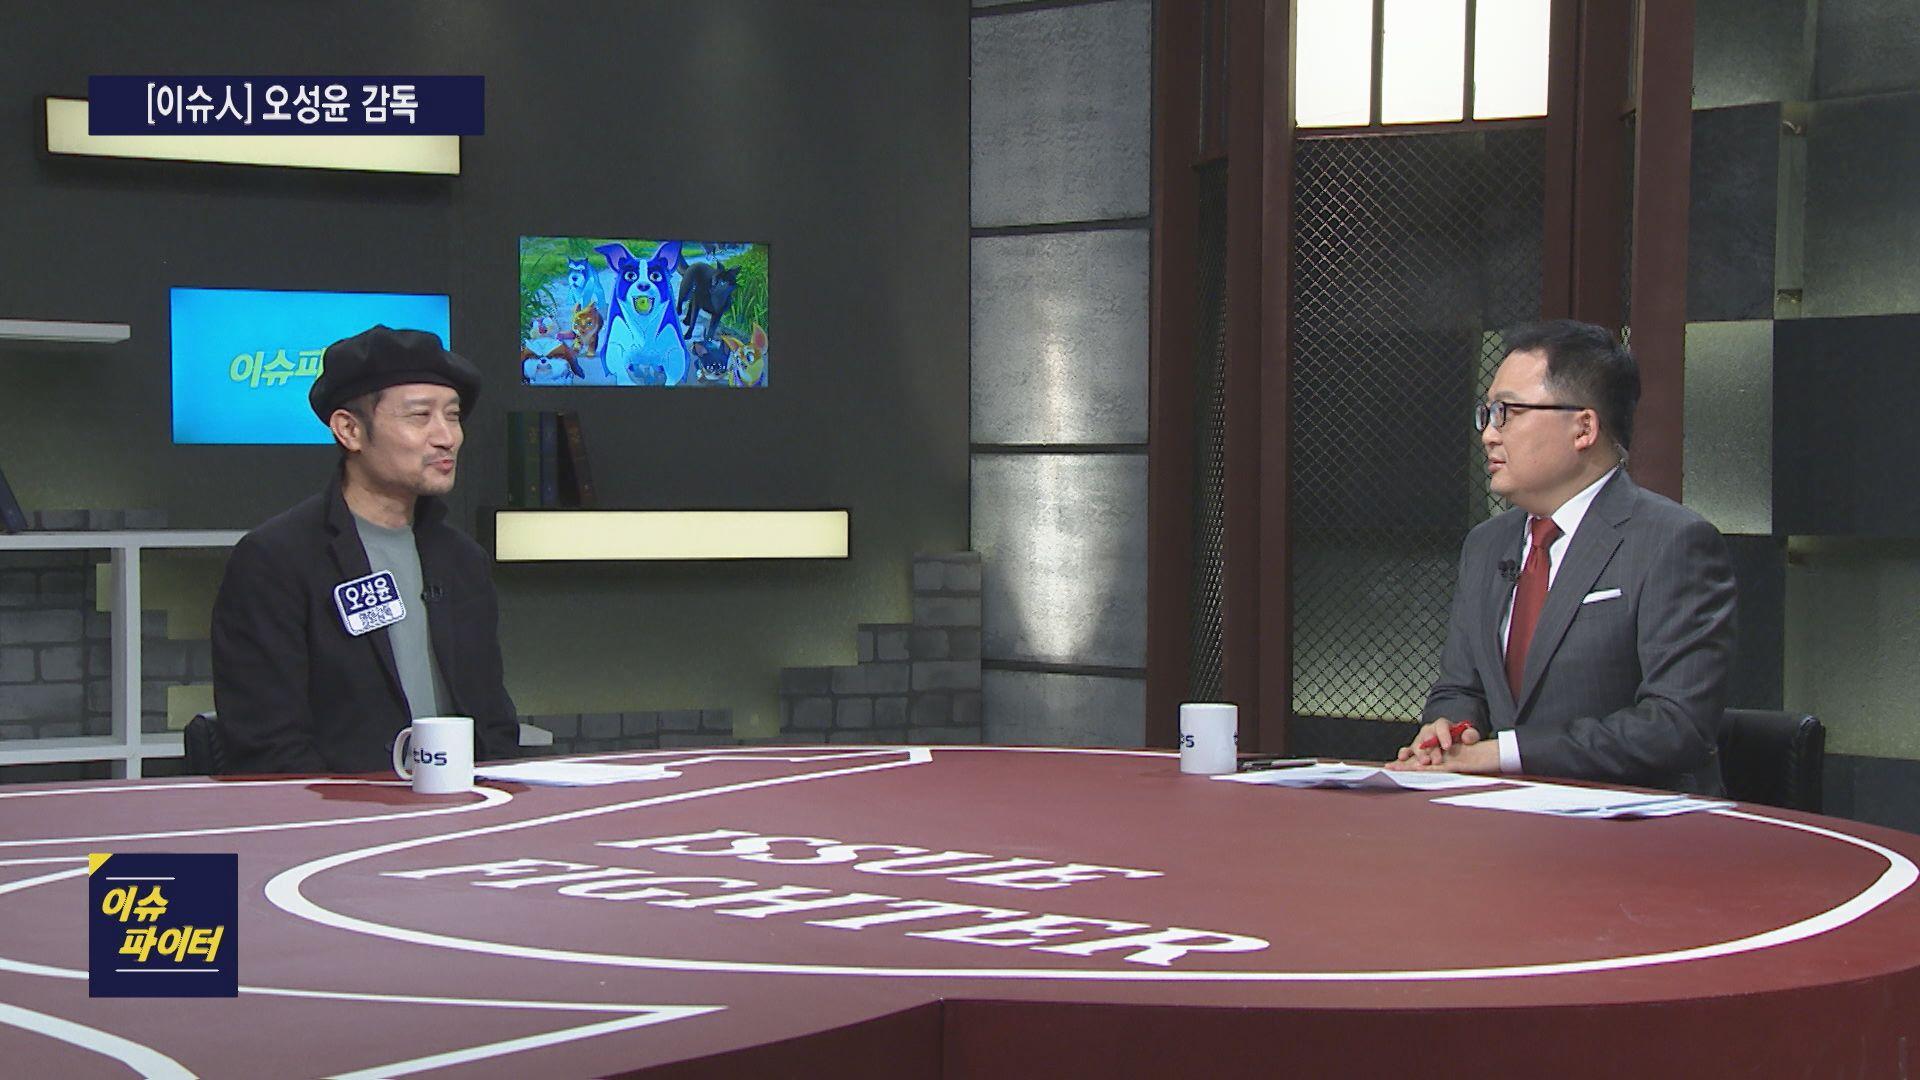 tbs 이슈파이터에 출연한 영화 <언더독>의 오성윤 감독